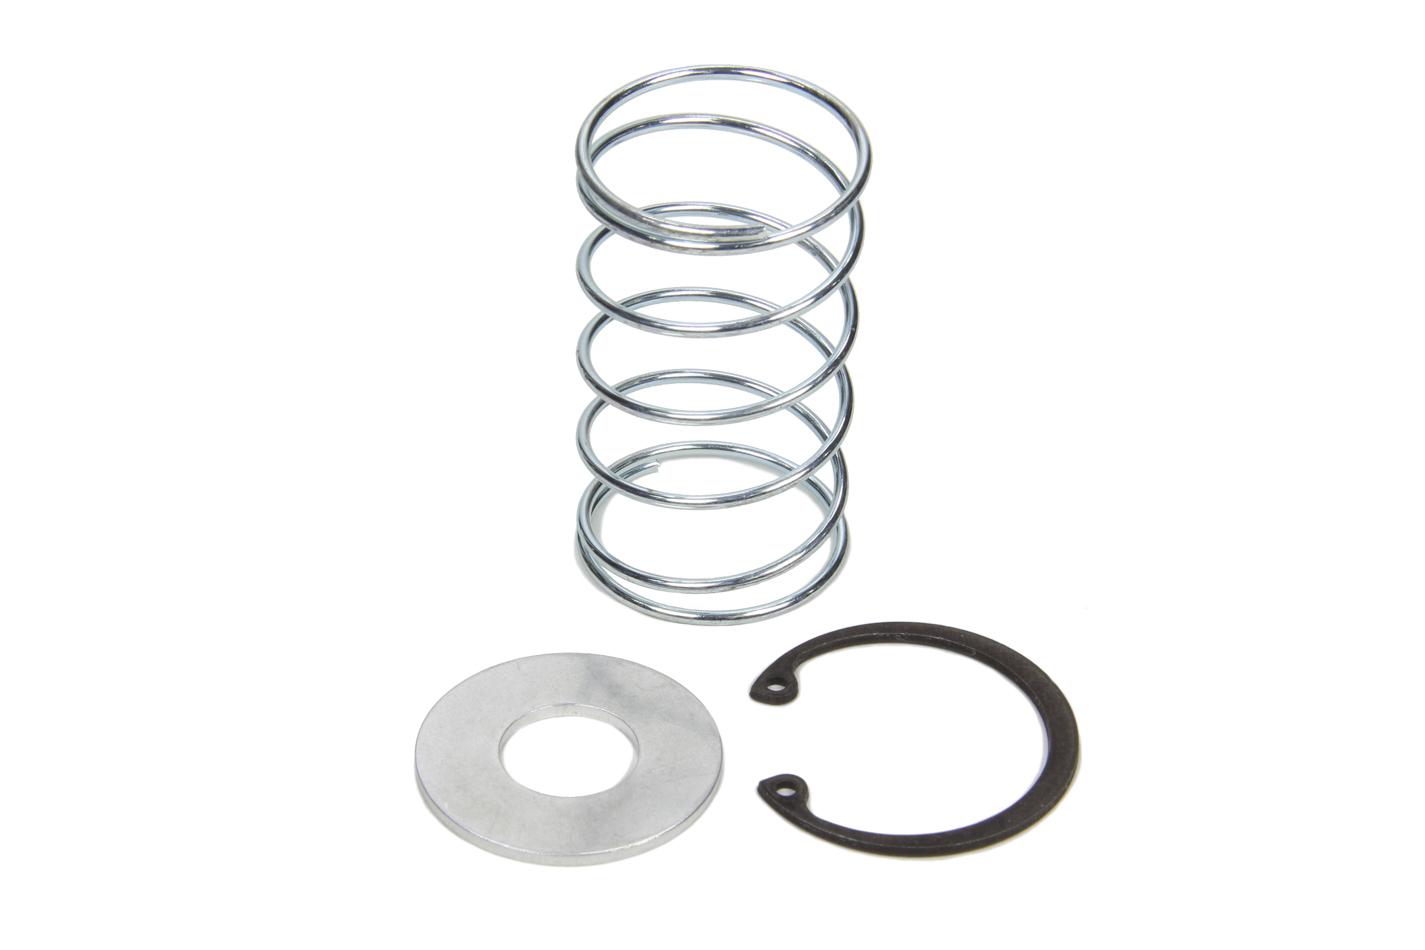 Ti22 Performance Washer/Retaining Ring /Spring for 4730